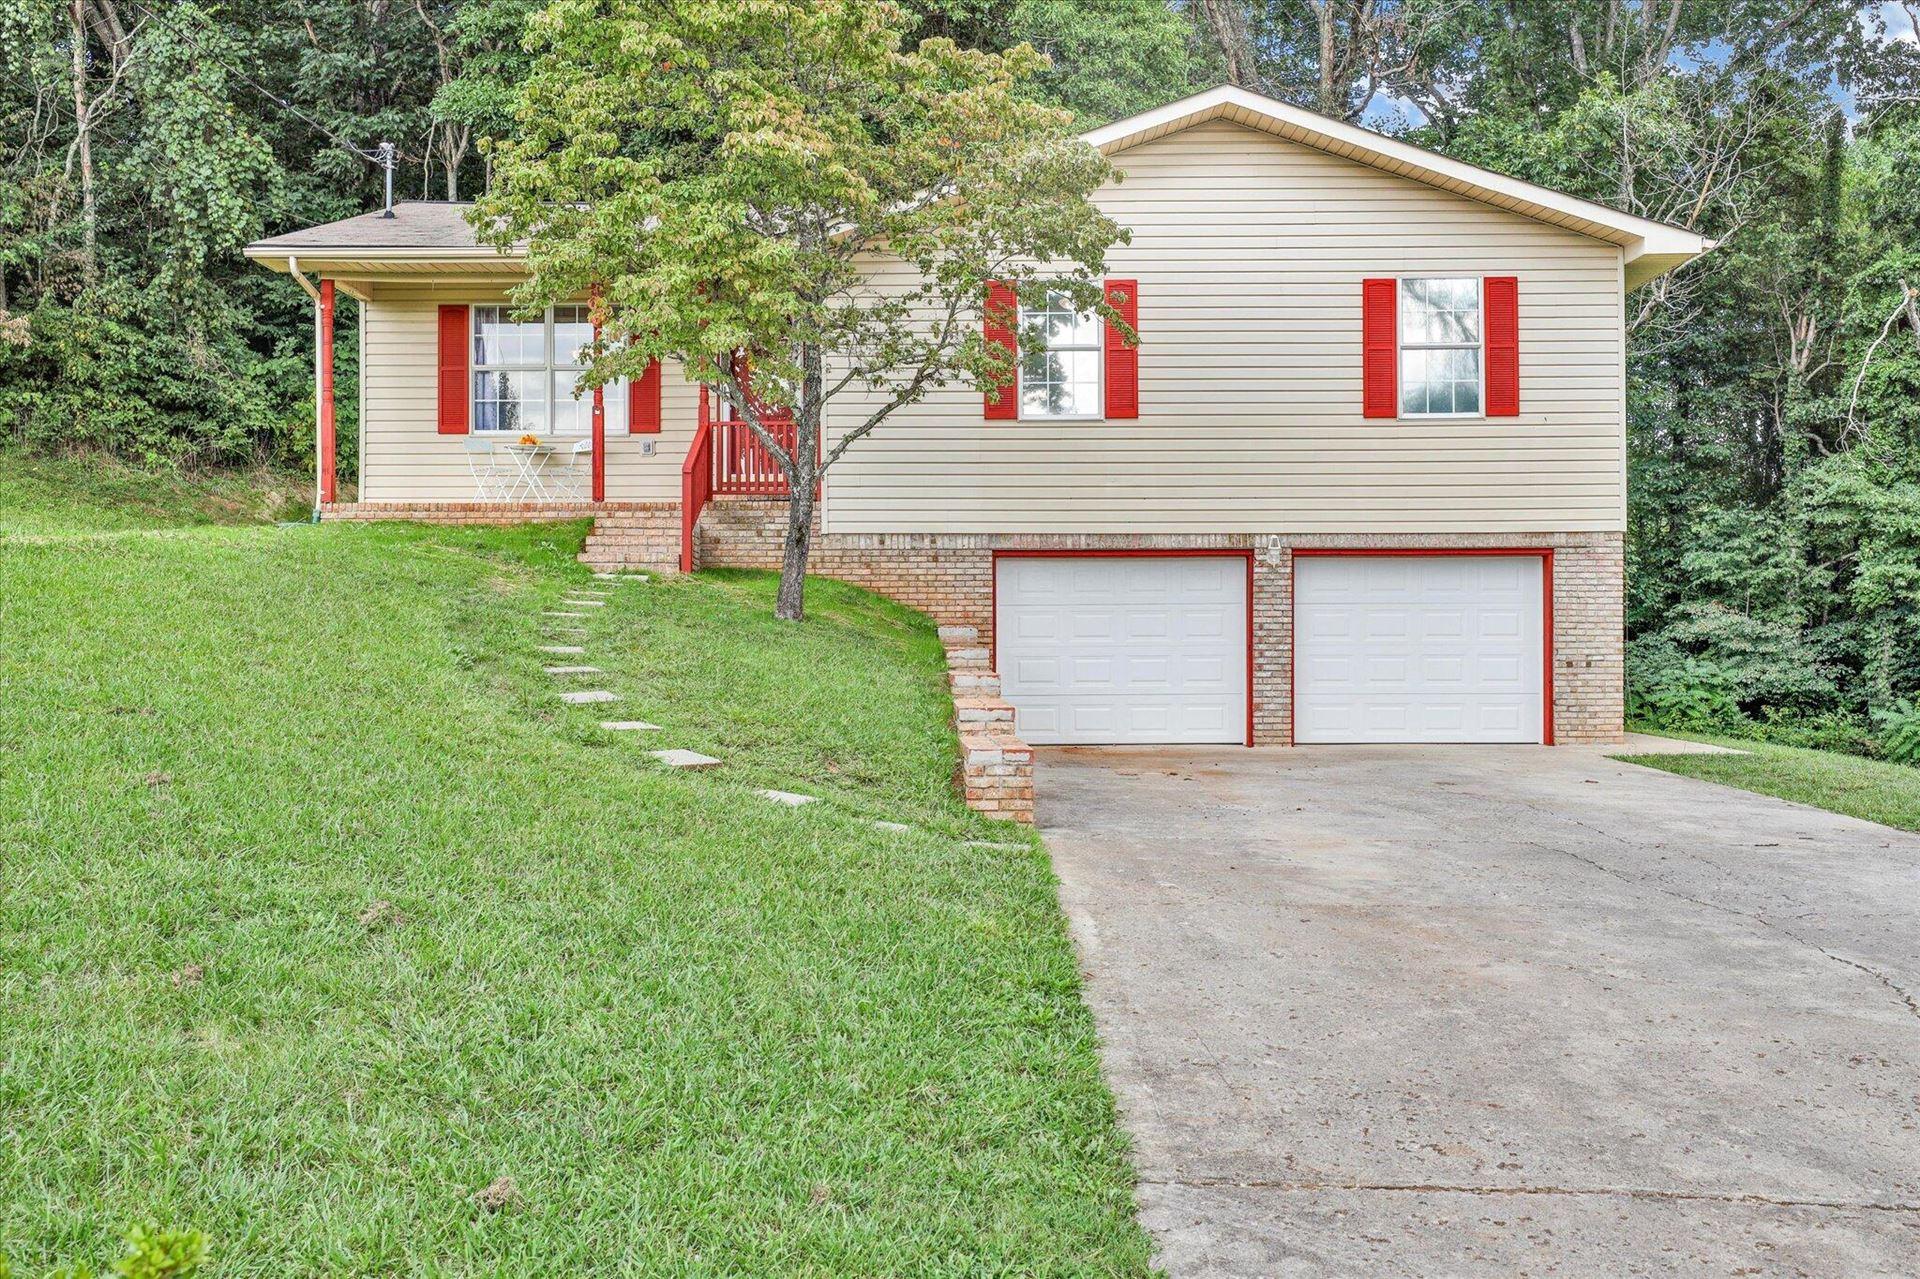 Photo of 270 Michal Lane, New Tazewell, TN 37825 (MLS # 1167166)